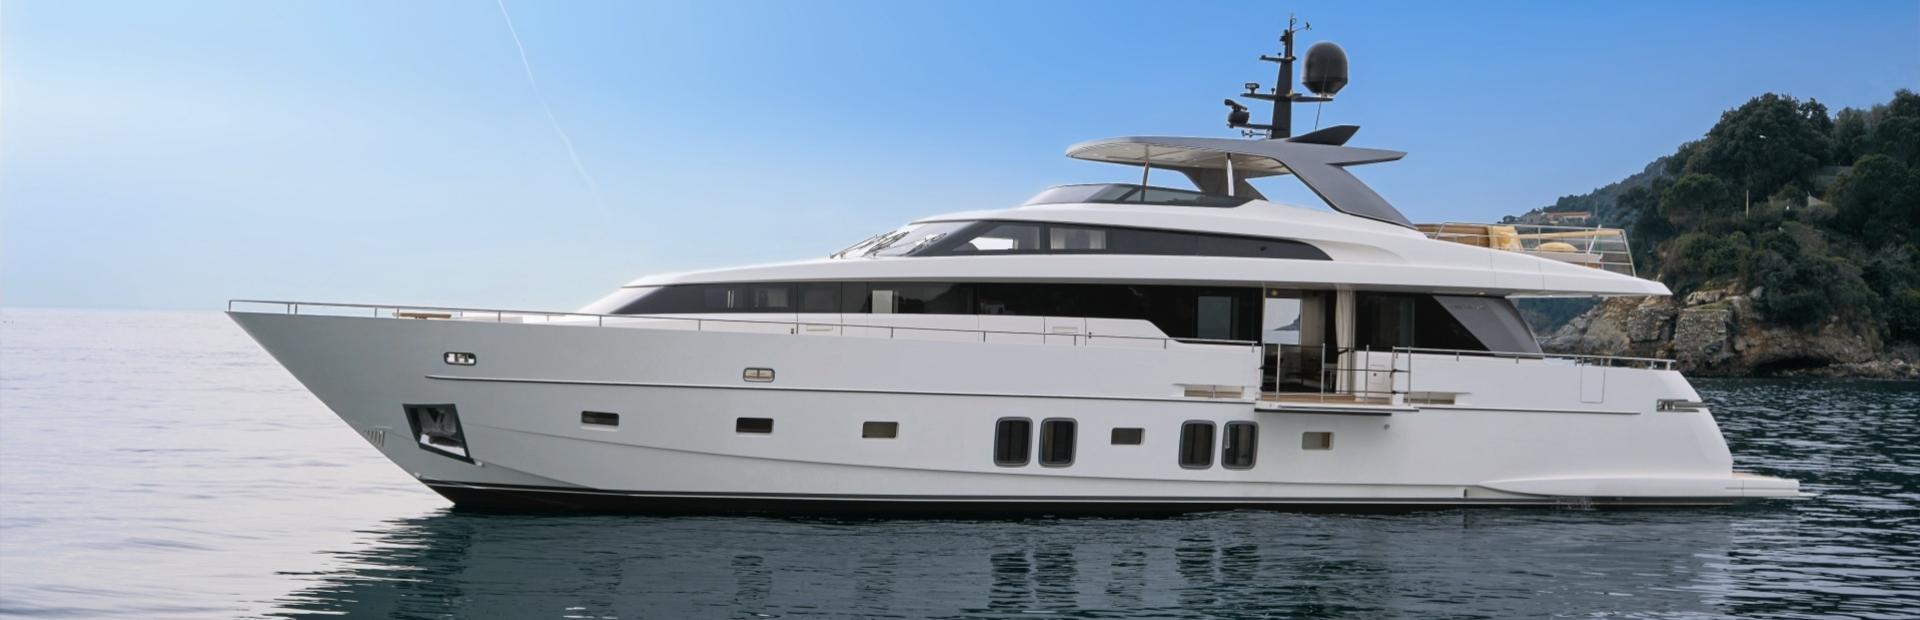 SL96 Yacht Charter